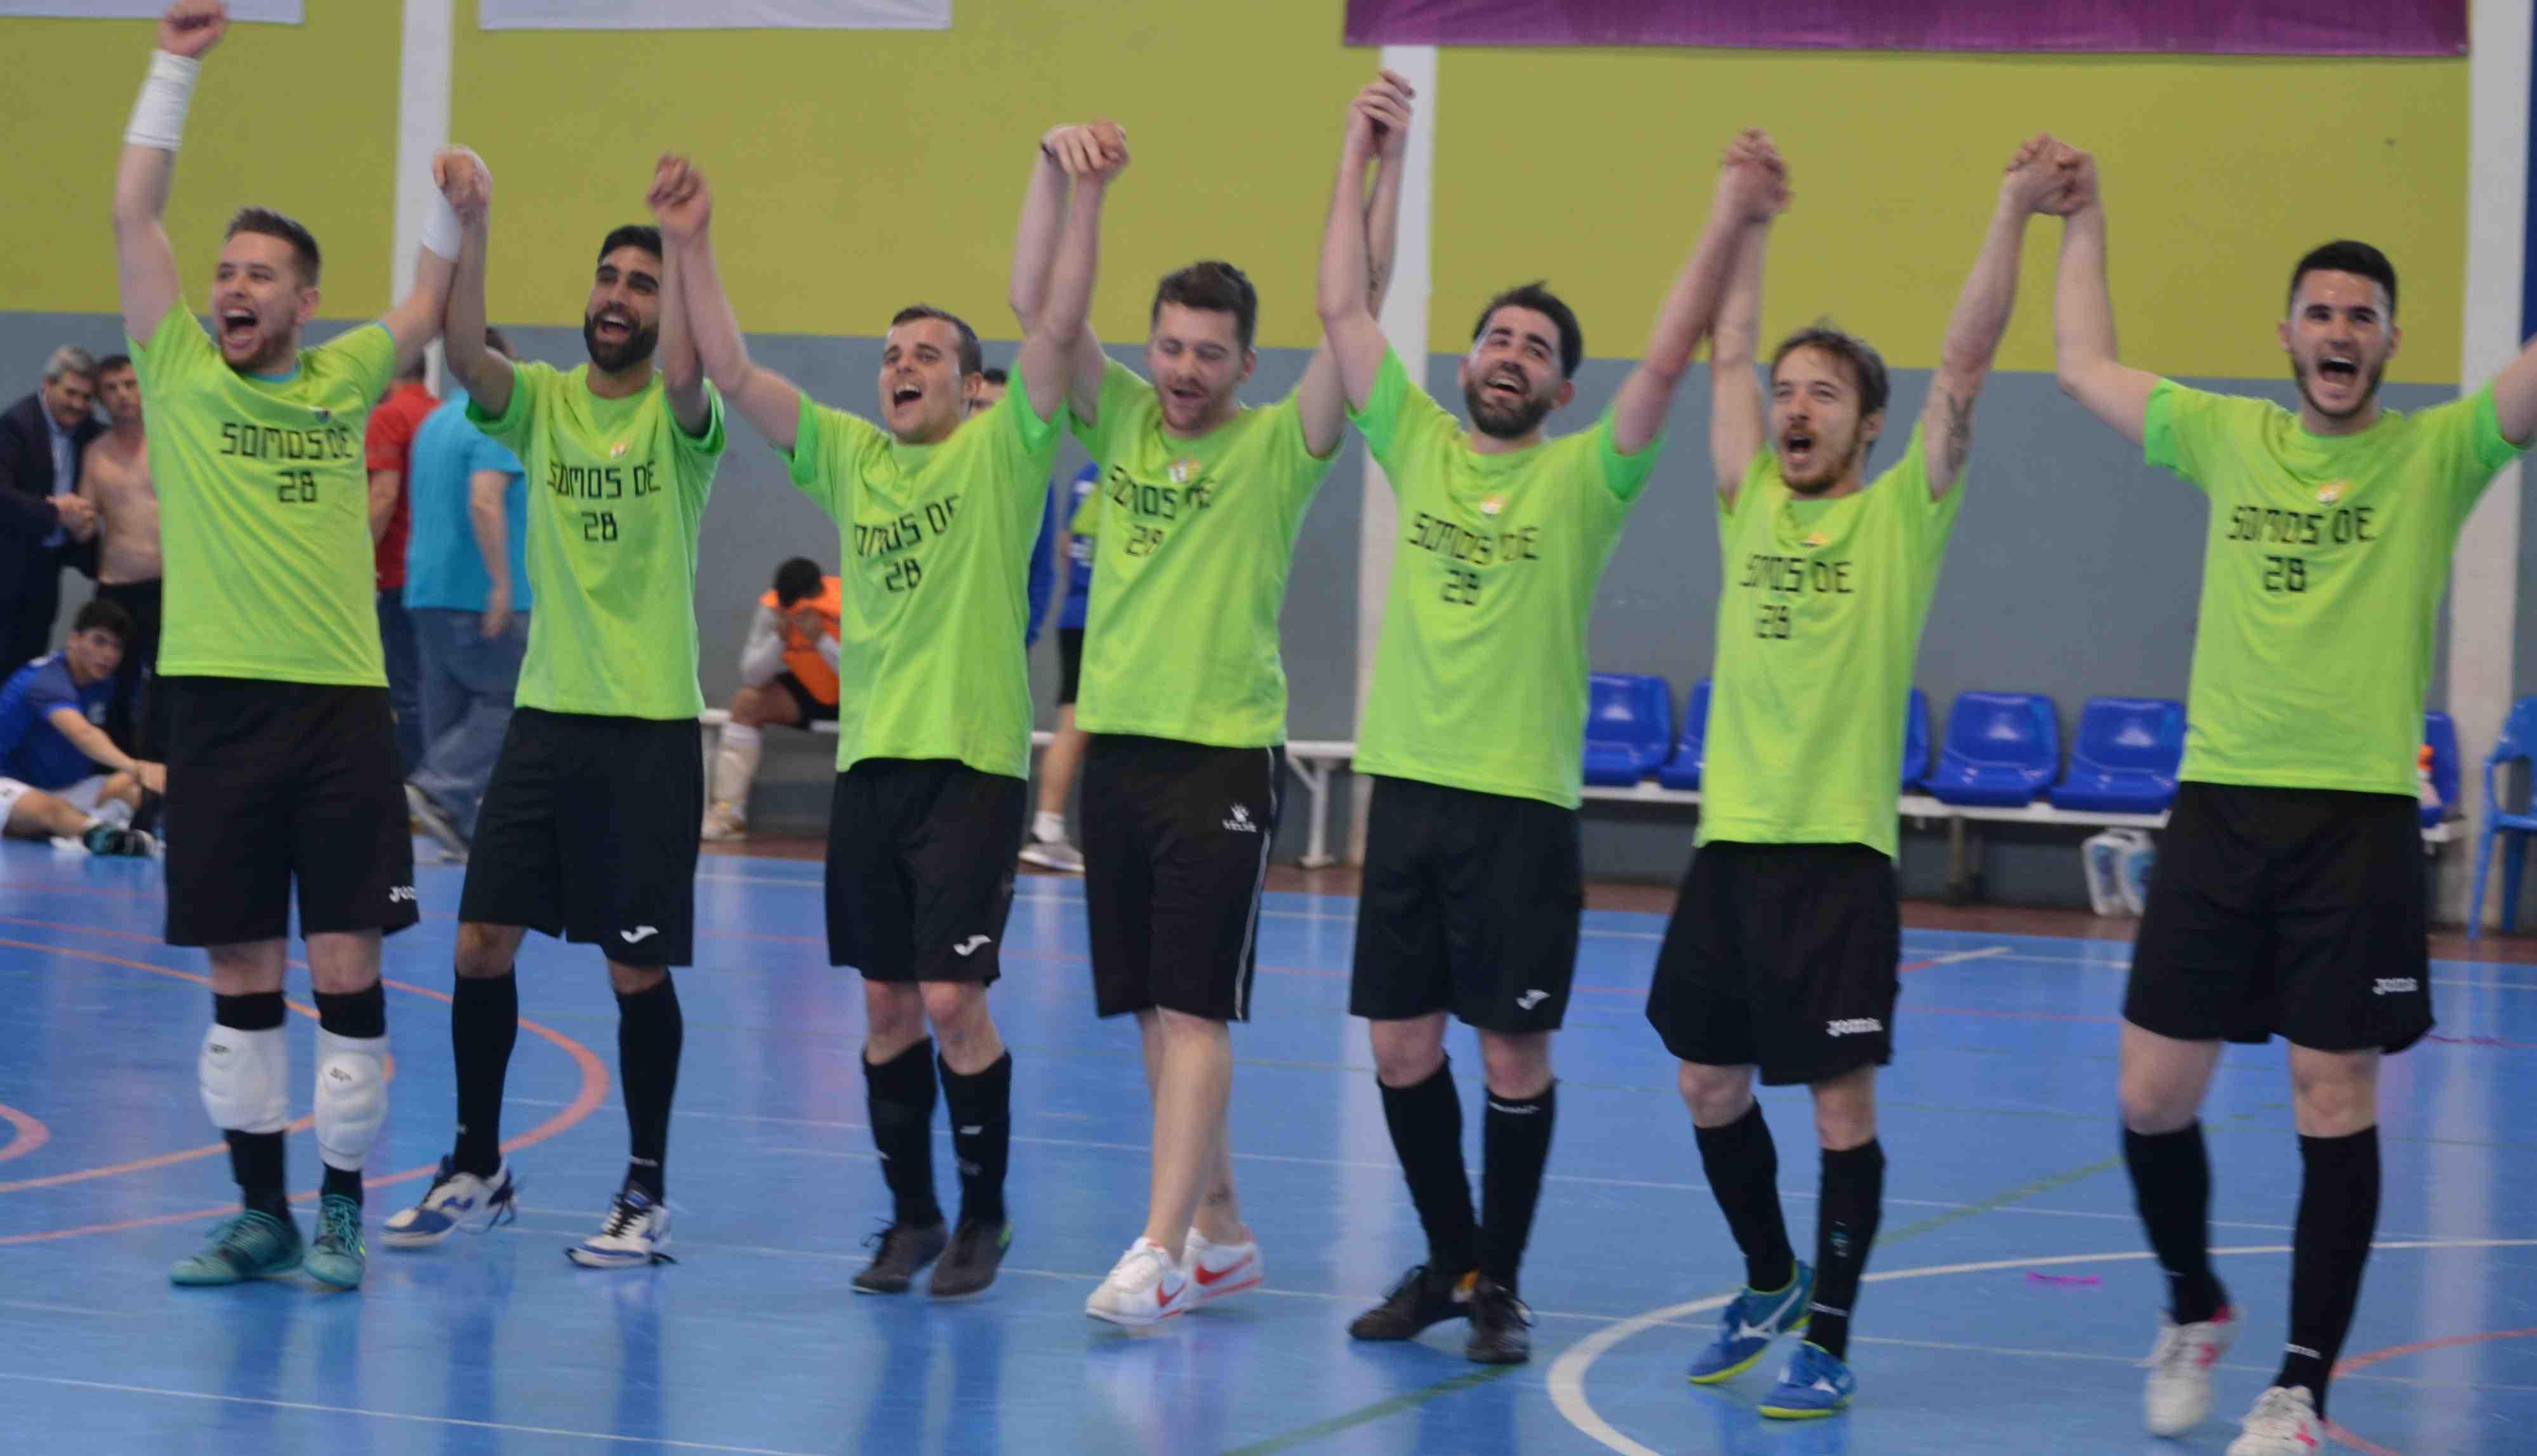 El Futsal Ibi renunciarà a jugar la temporada que si no el canvien de grup